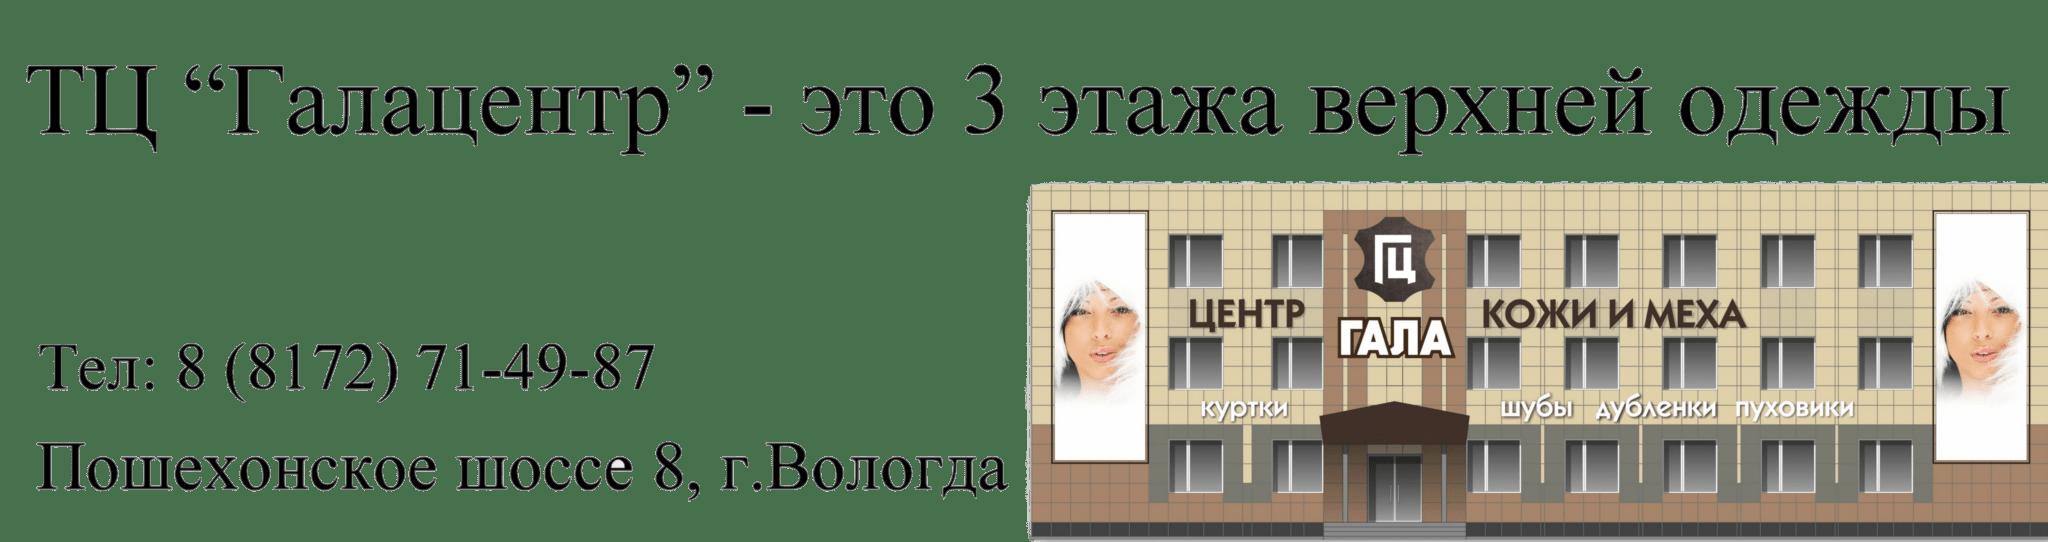 ТЦ Галацентр - шубы, дубленки, куртки, пуховики Вологда